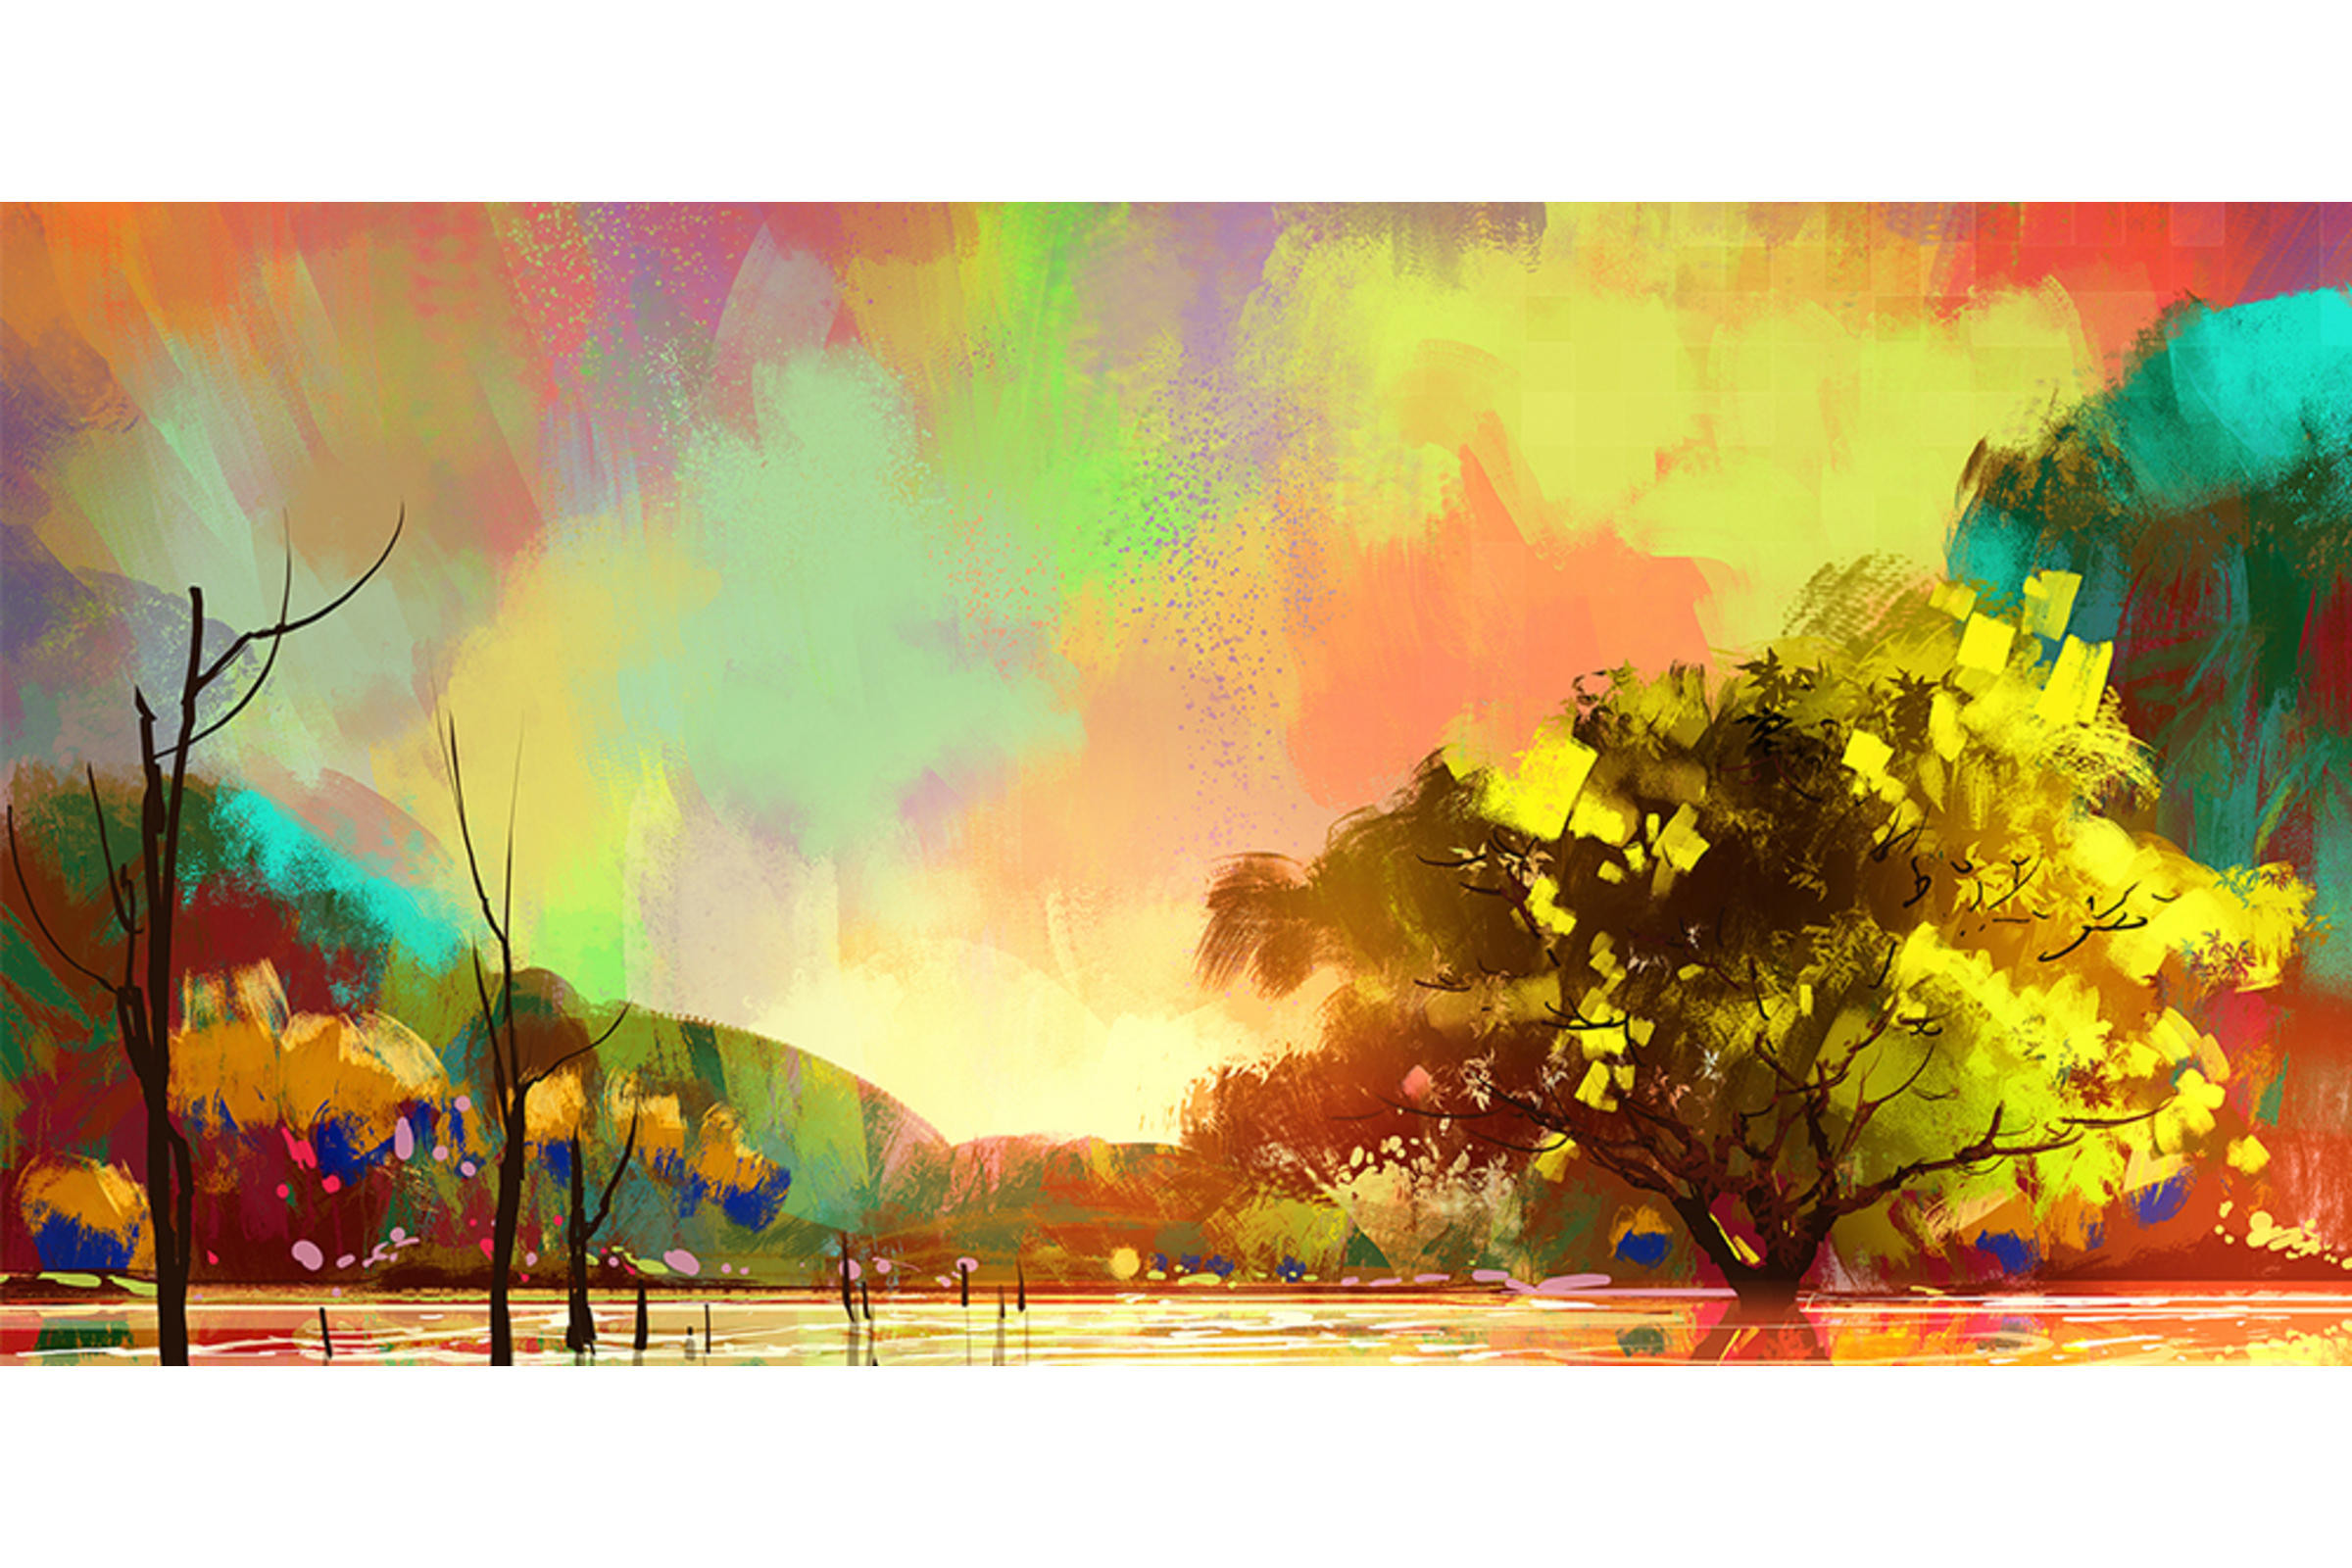 Digital Painting Landscape Inspirational Paint Your First Digital Landscape Corel Discovery Center